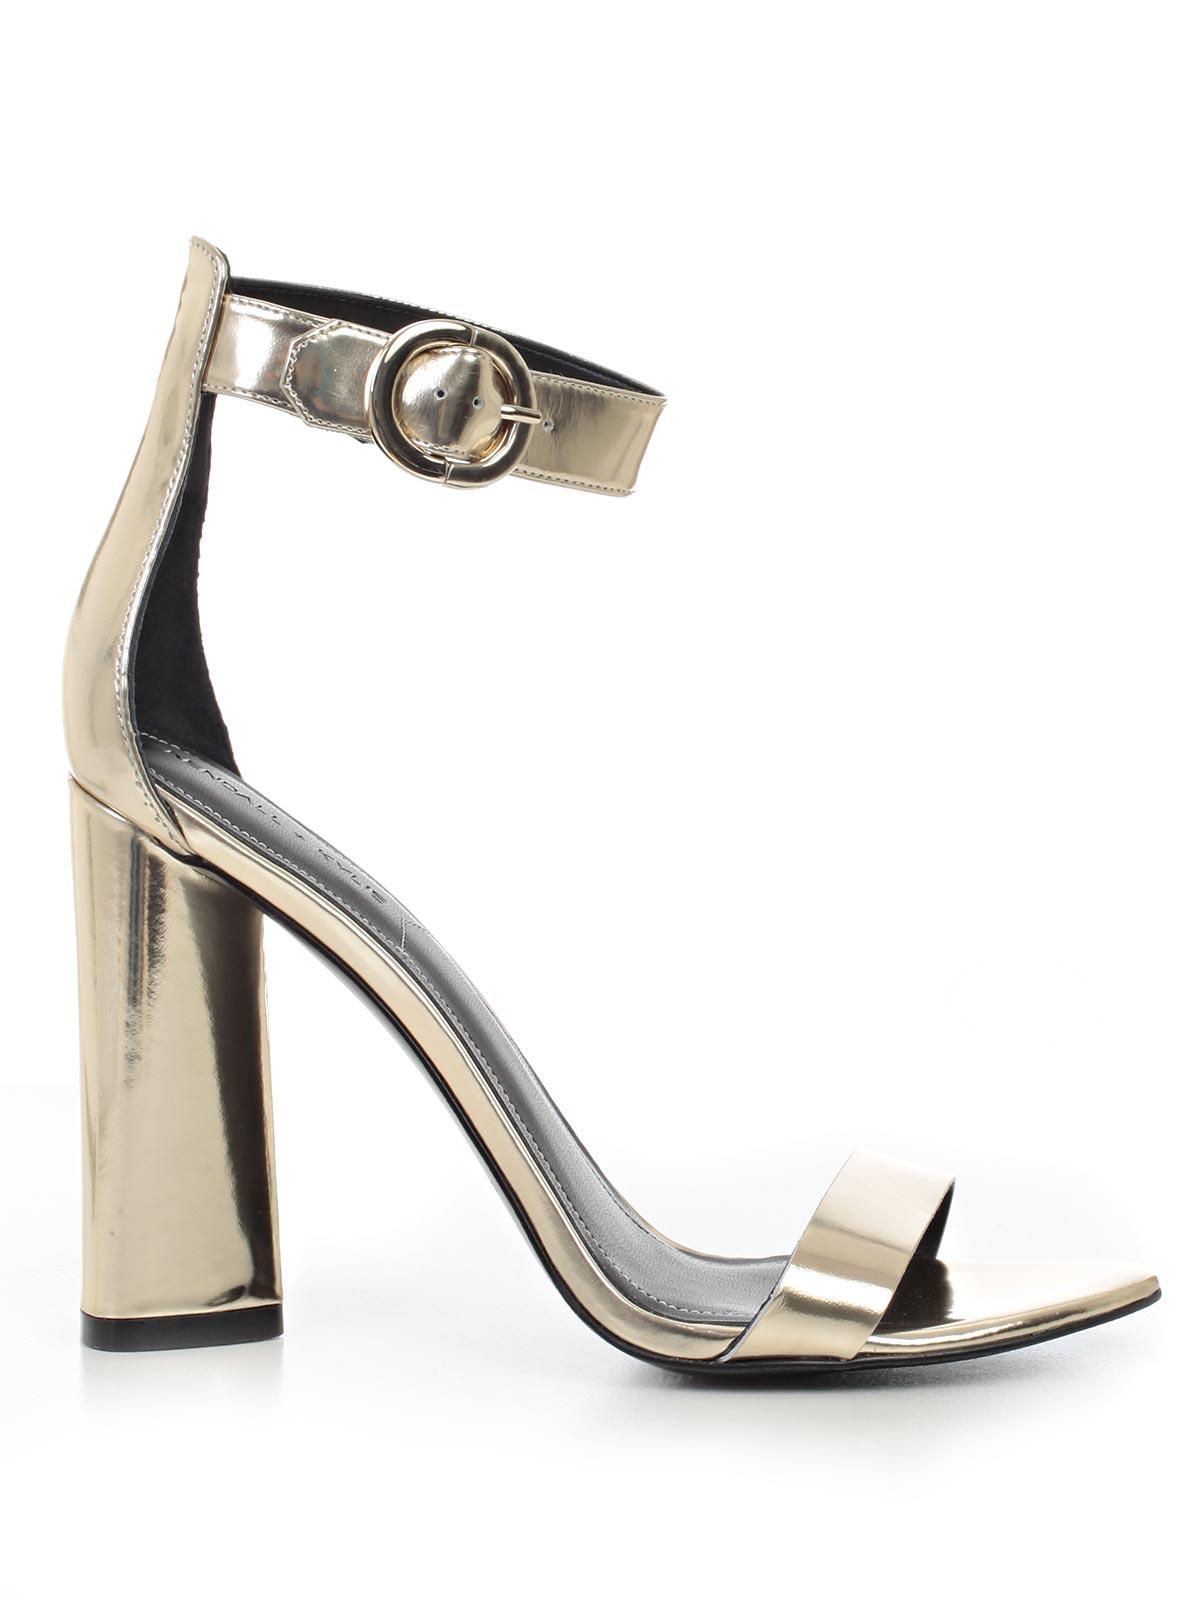 Picture of KENDALL + KYLIE Footwear